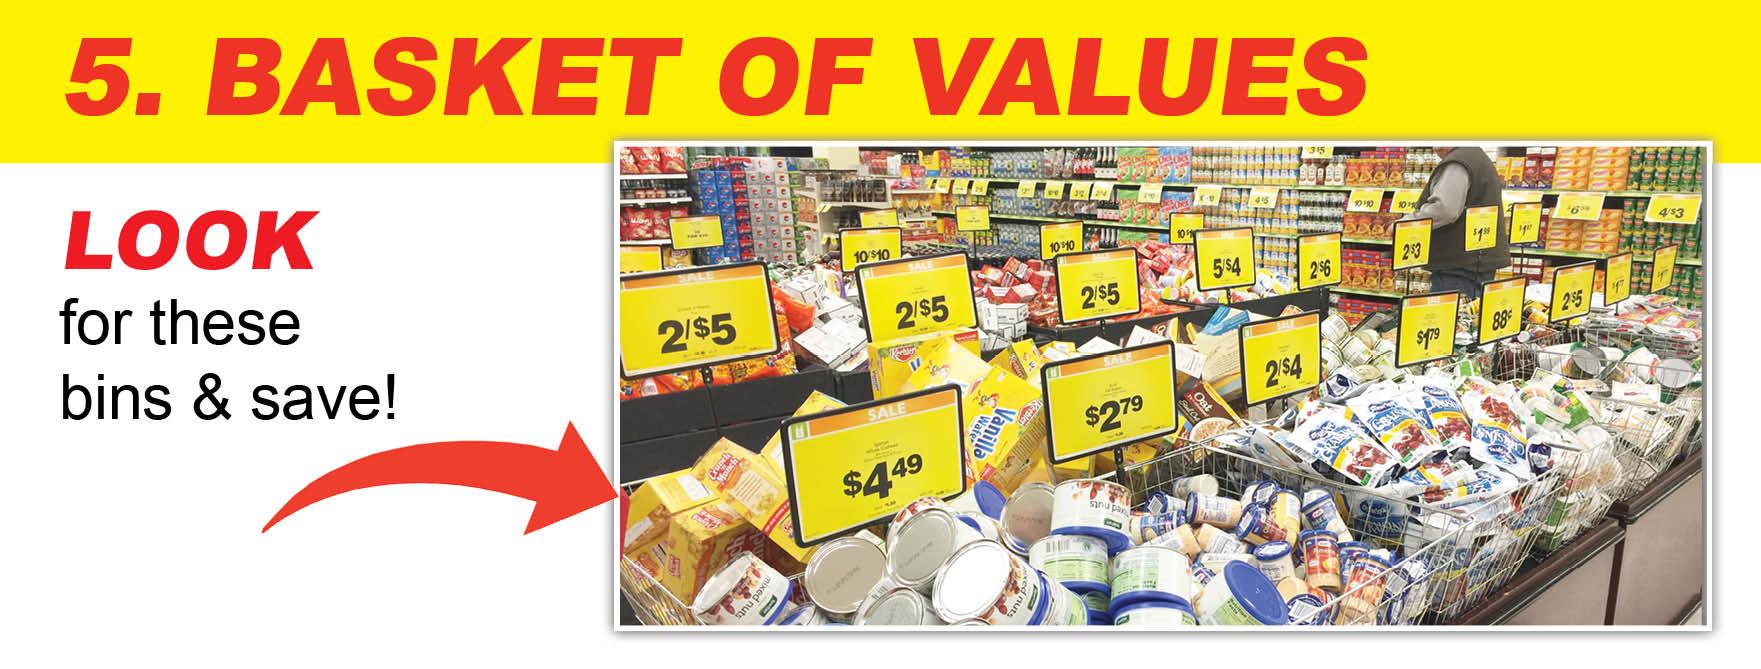 Baskets of Value